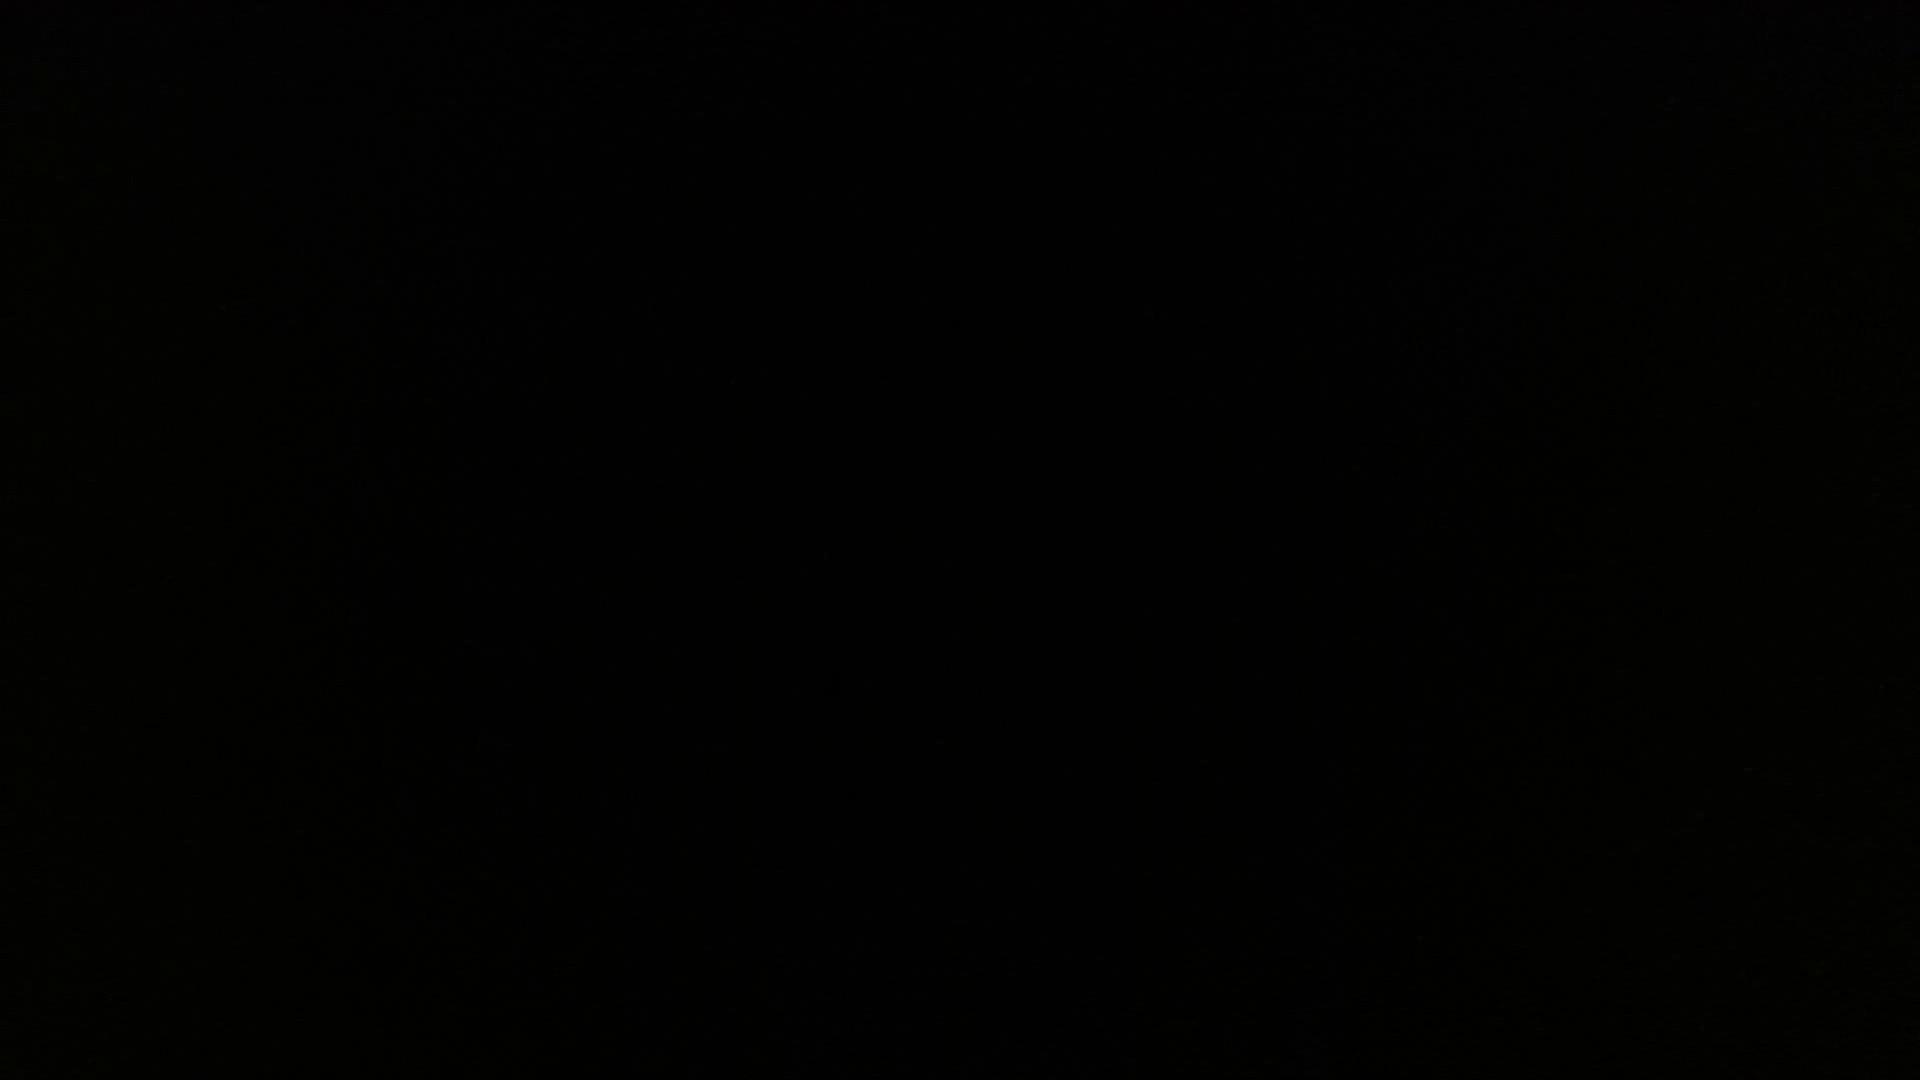 SPYさん初投稿!マンション覗き!5000K!ハイビジョン撮影VOL.03(元野球部社会人編) 完全無修正  109pic 39